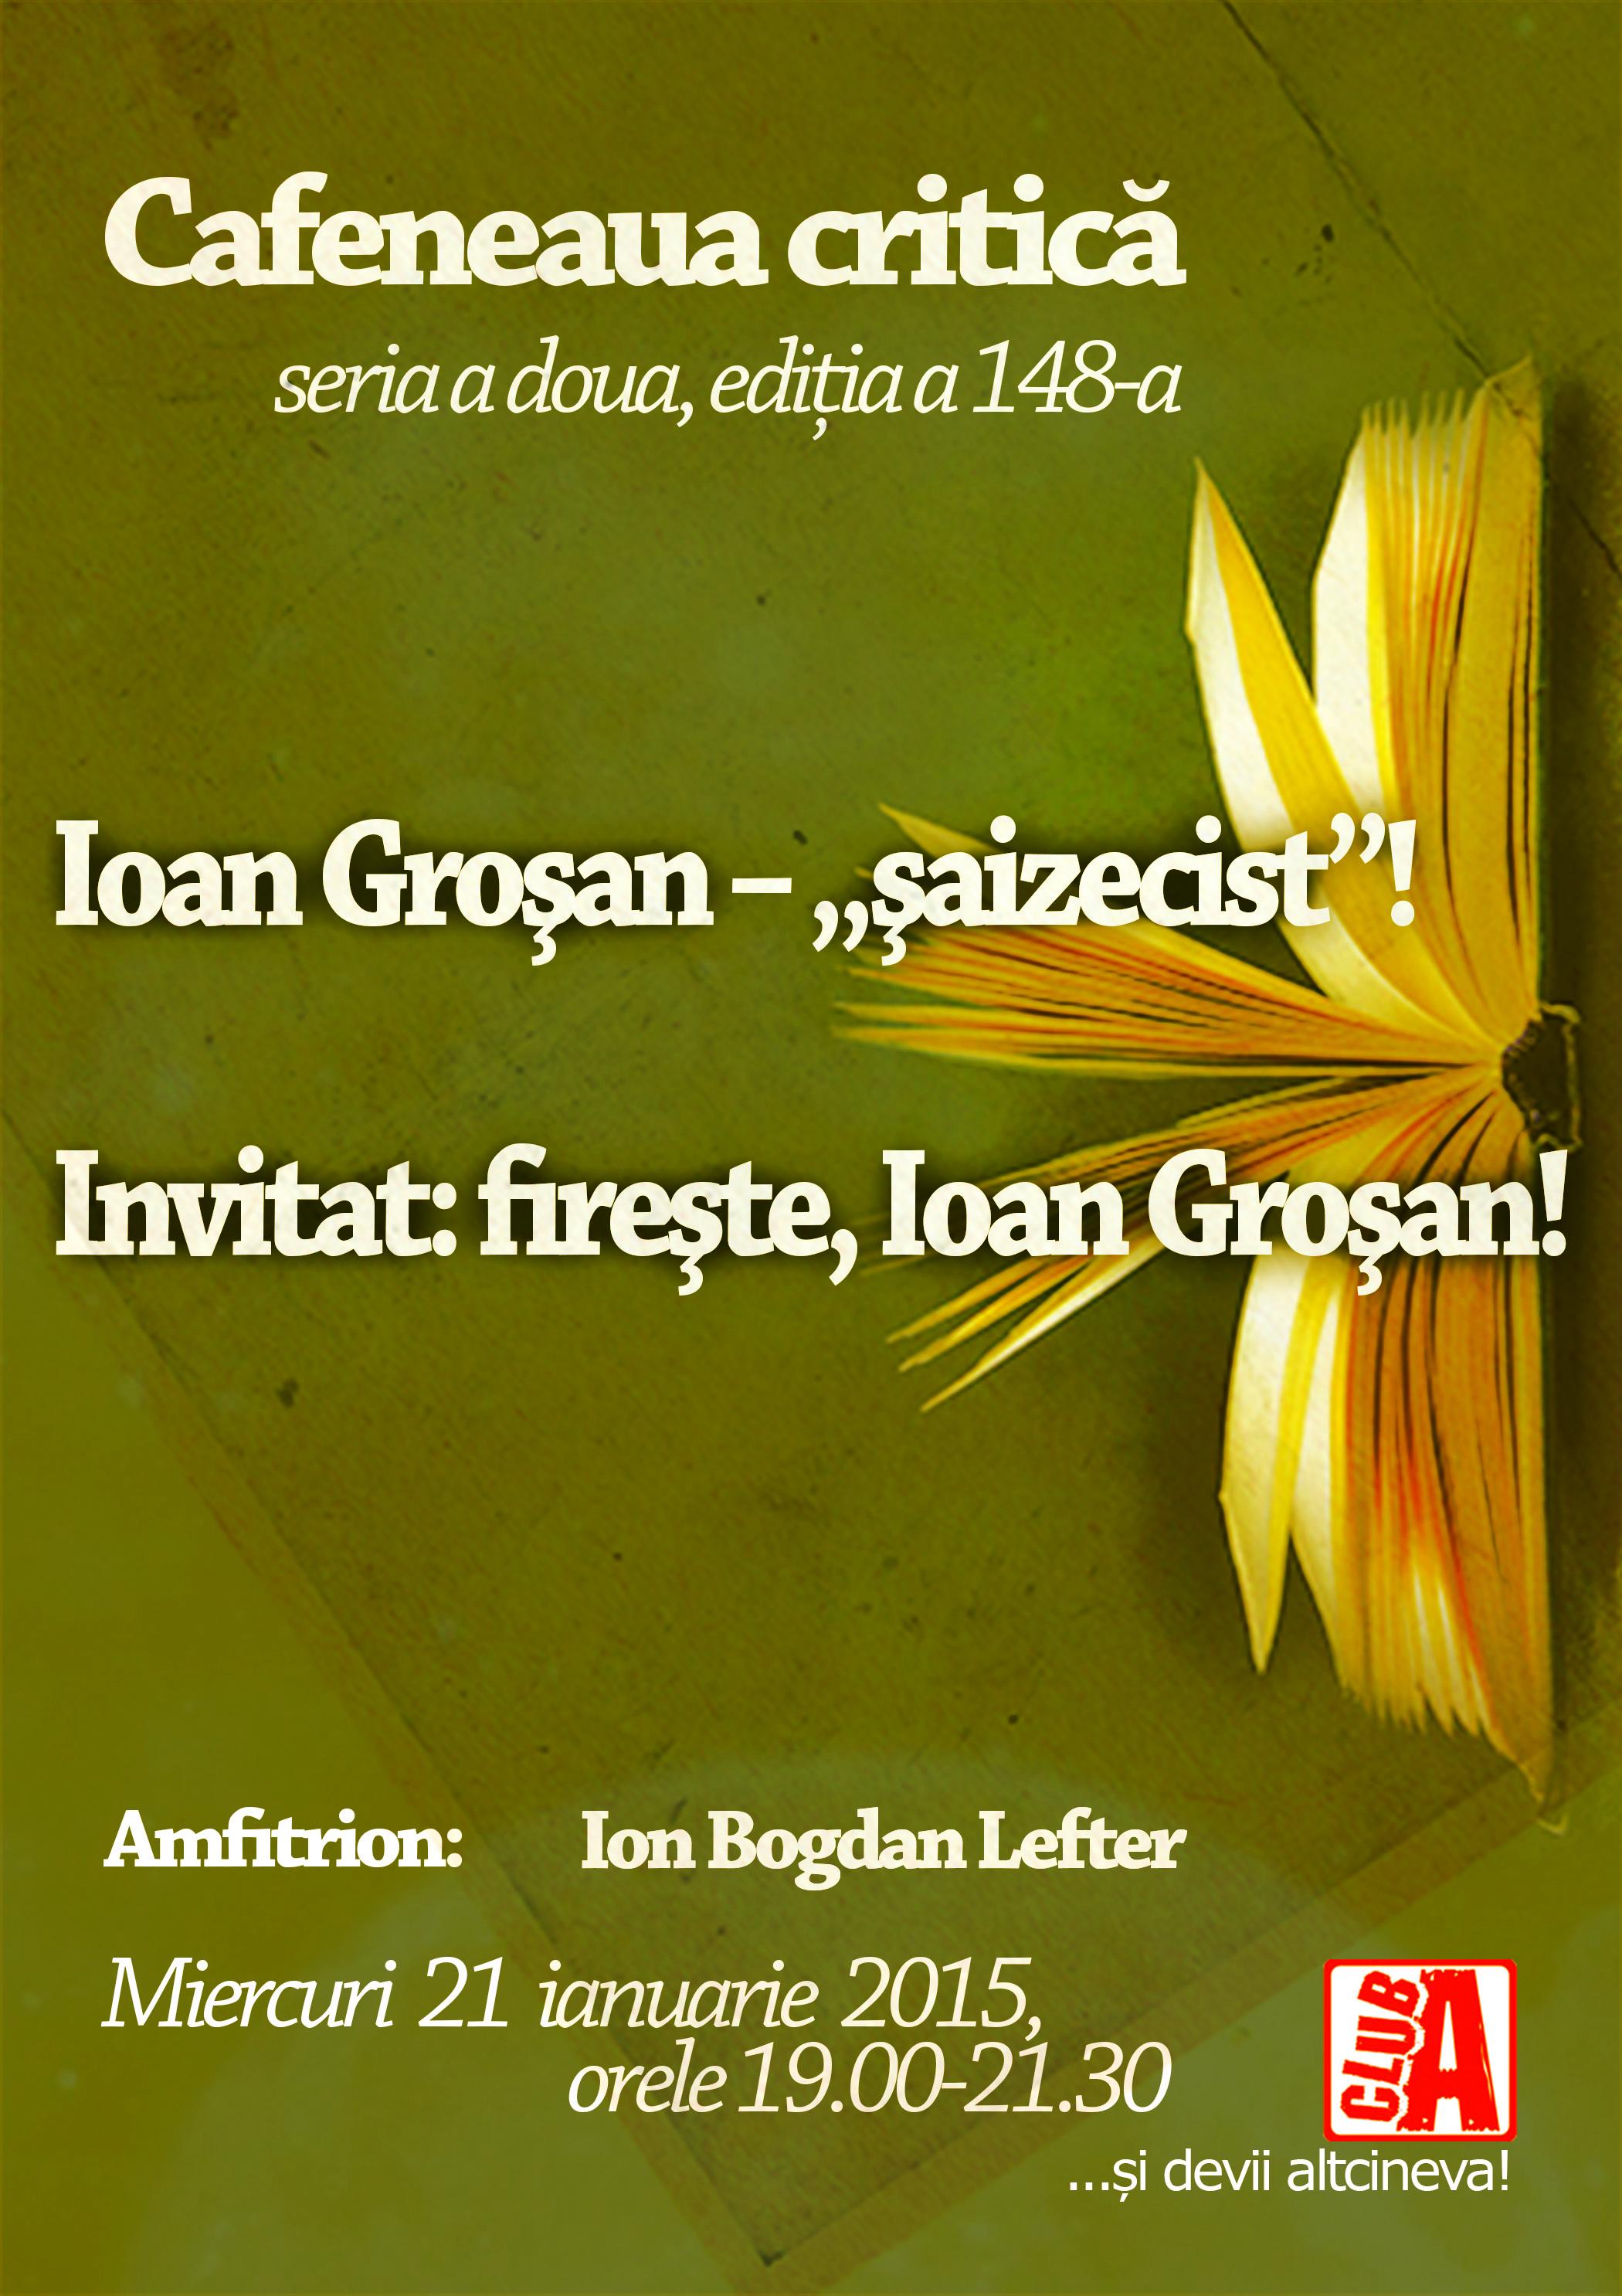 Cafeneaua critica 148 Ioan Grosan AFIS